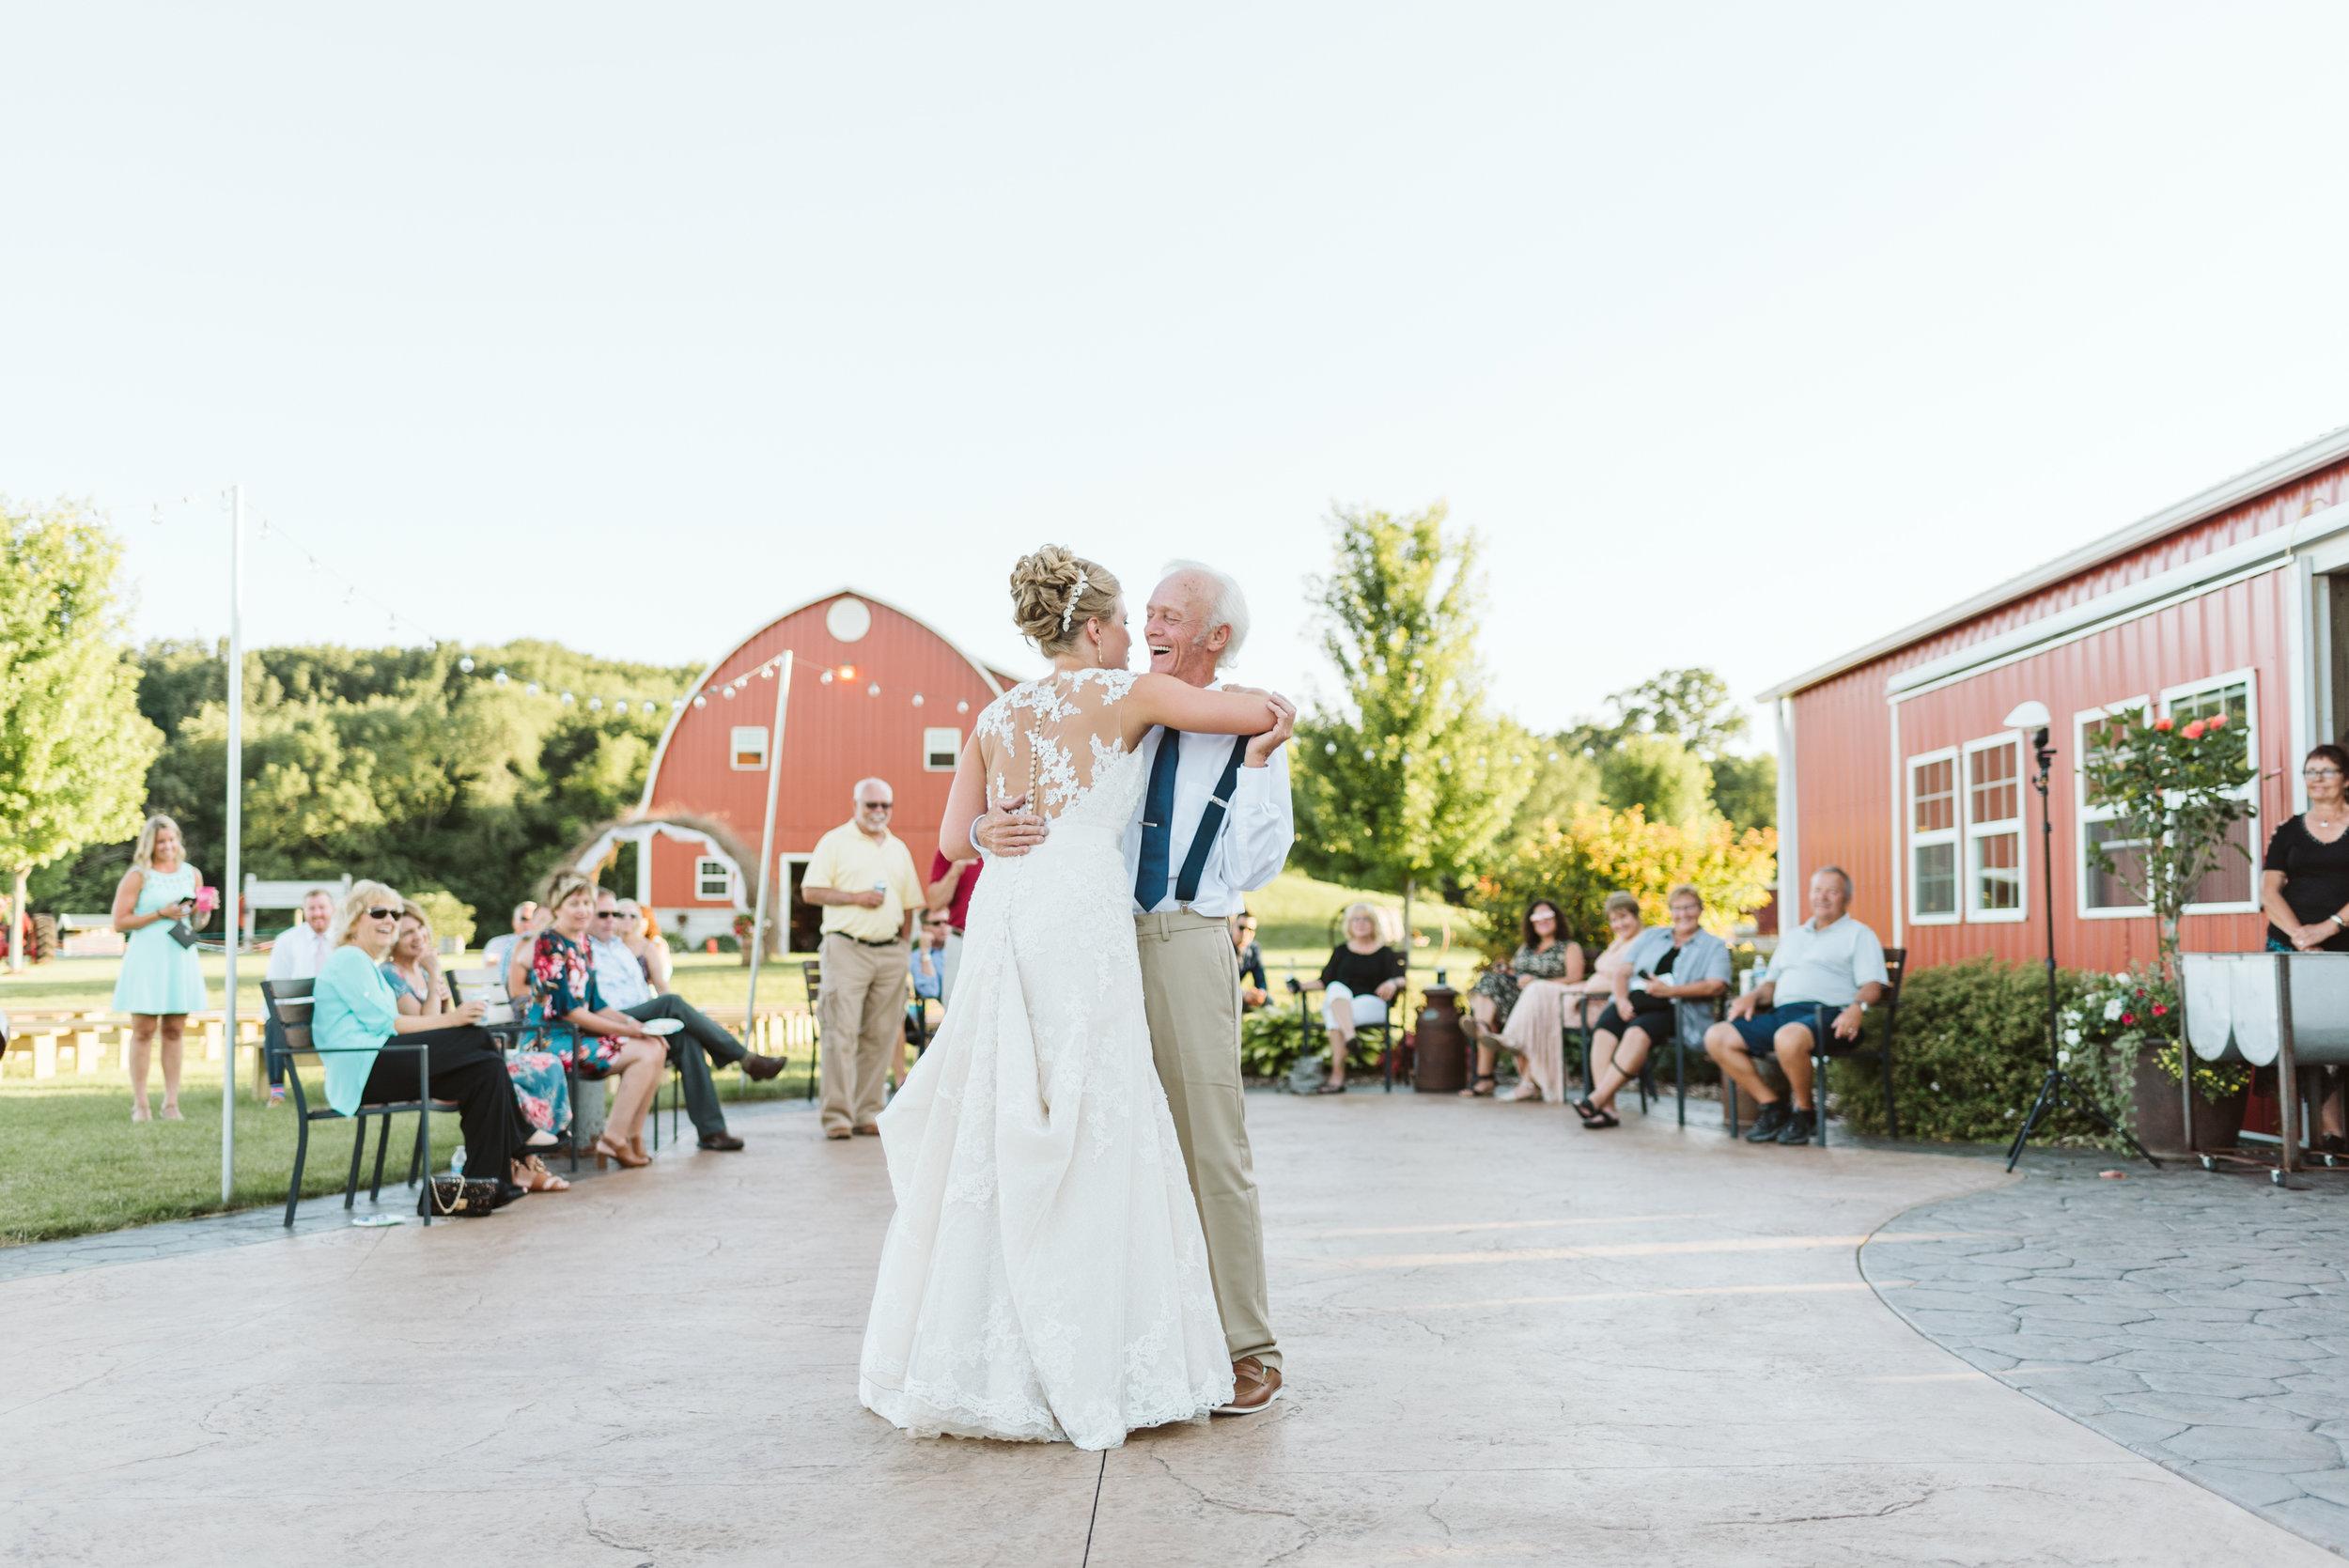 Fort Atkinson Wedding Photographer Busy Barns Adventure Farm Wedding